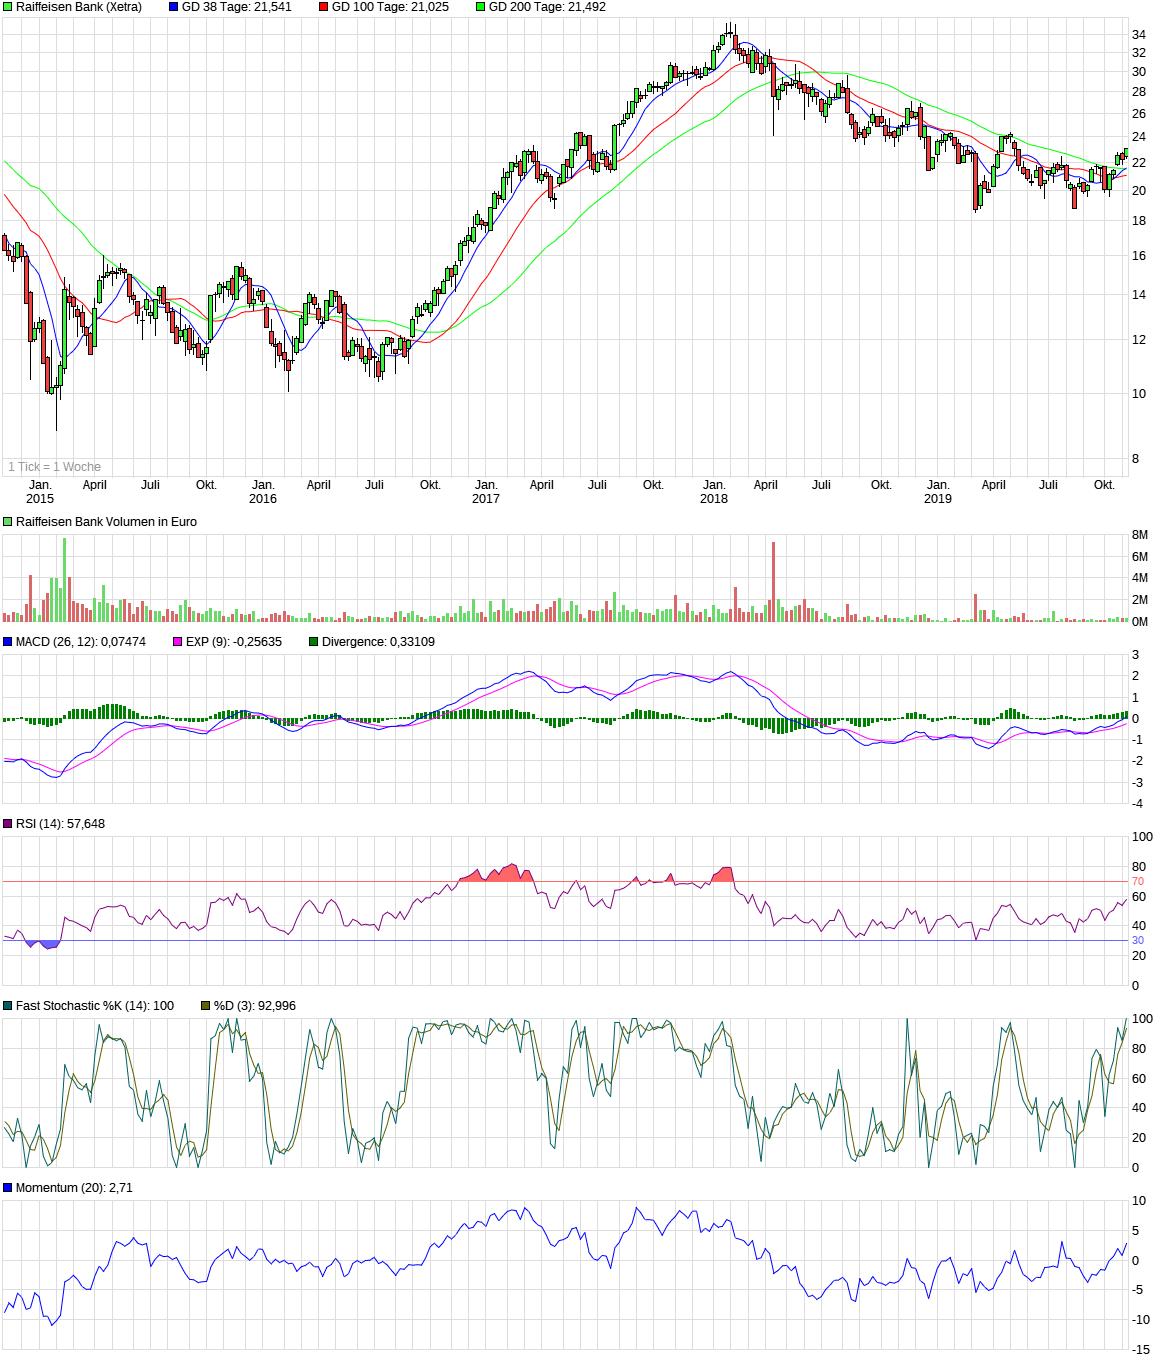 chart_5years_raiffeisenbank.png